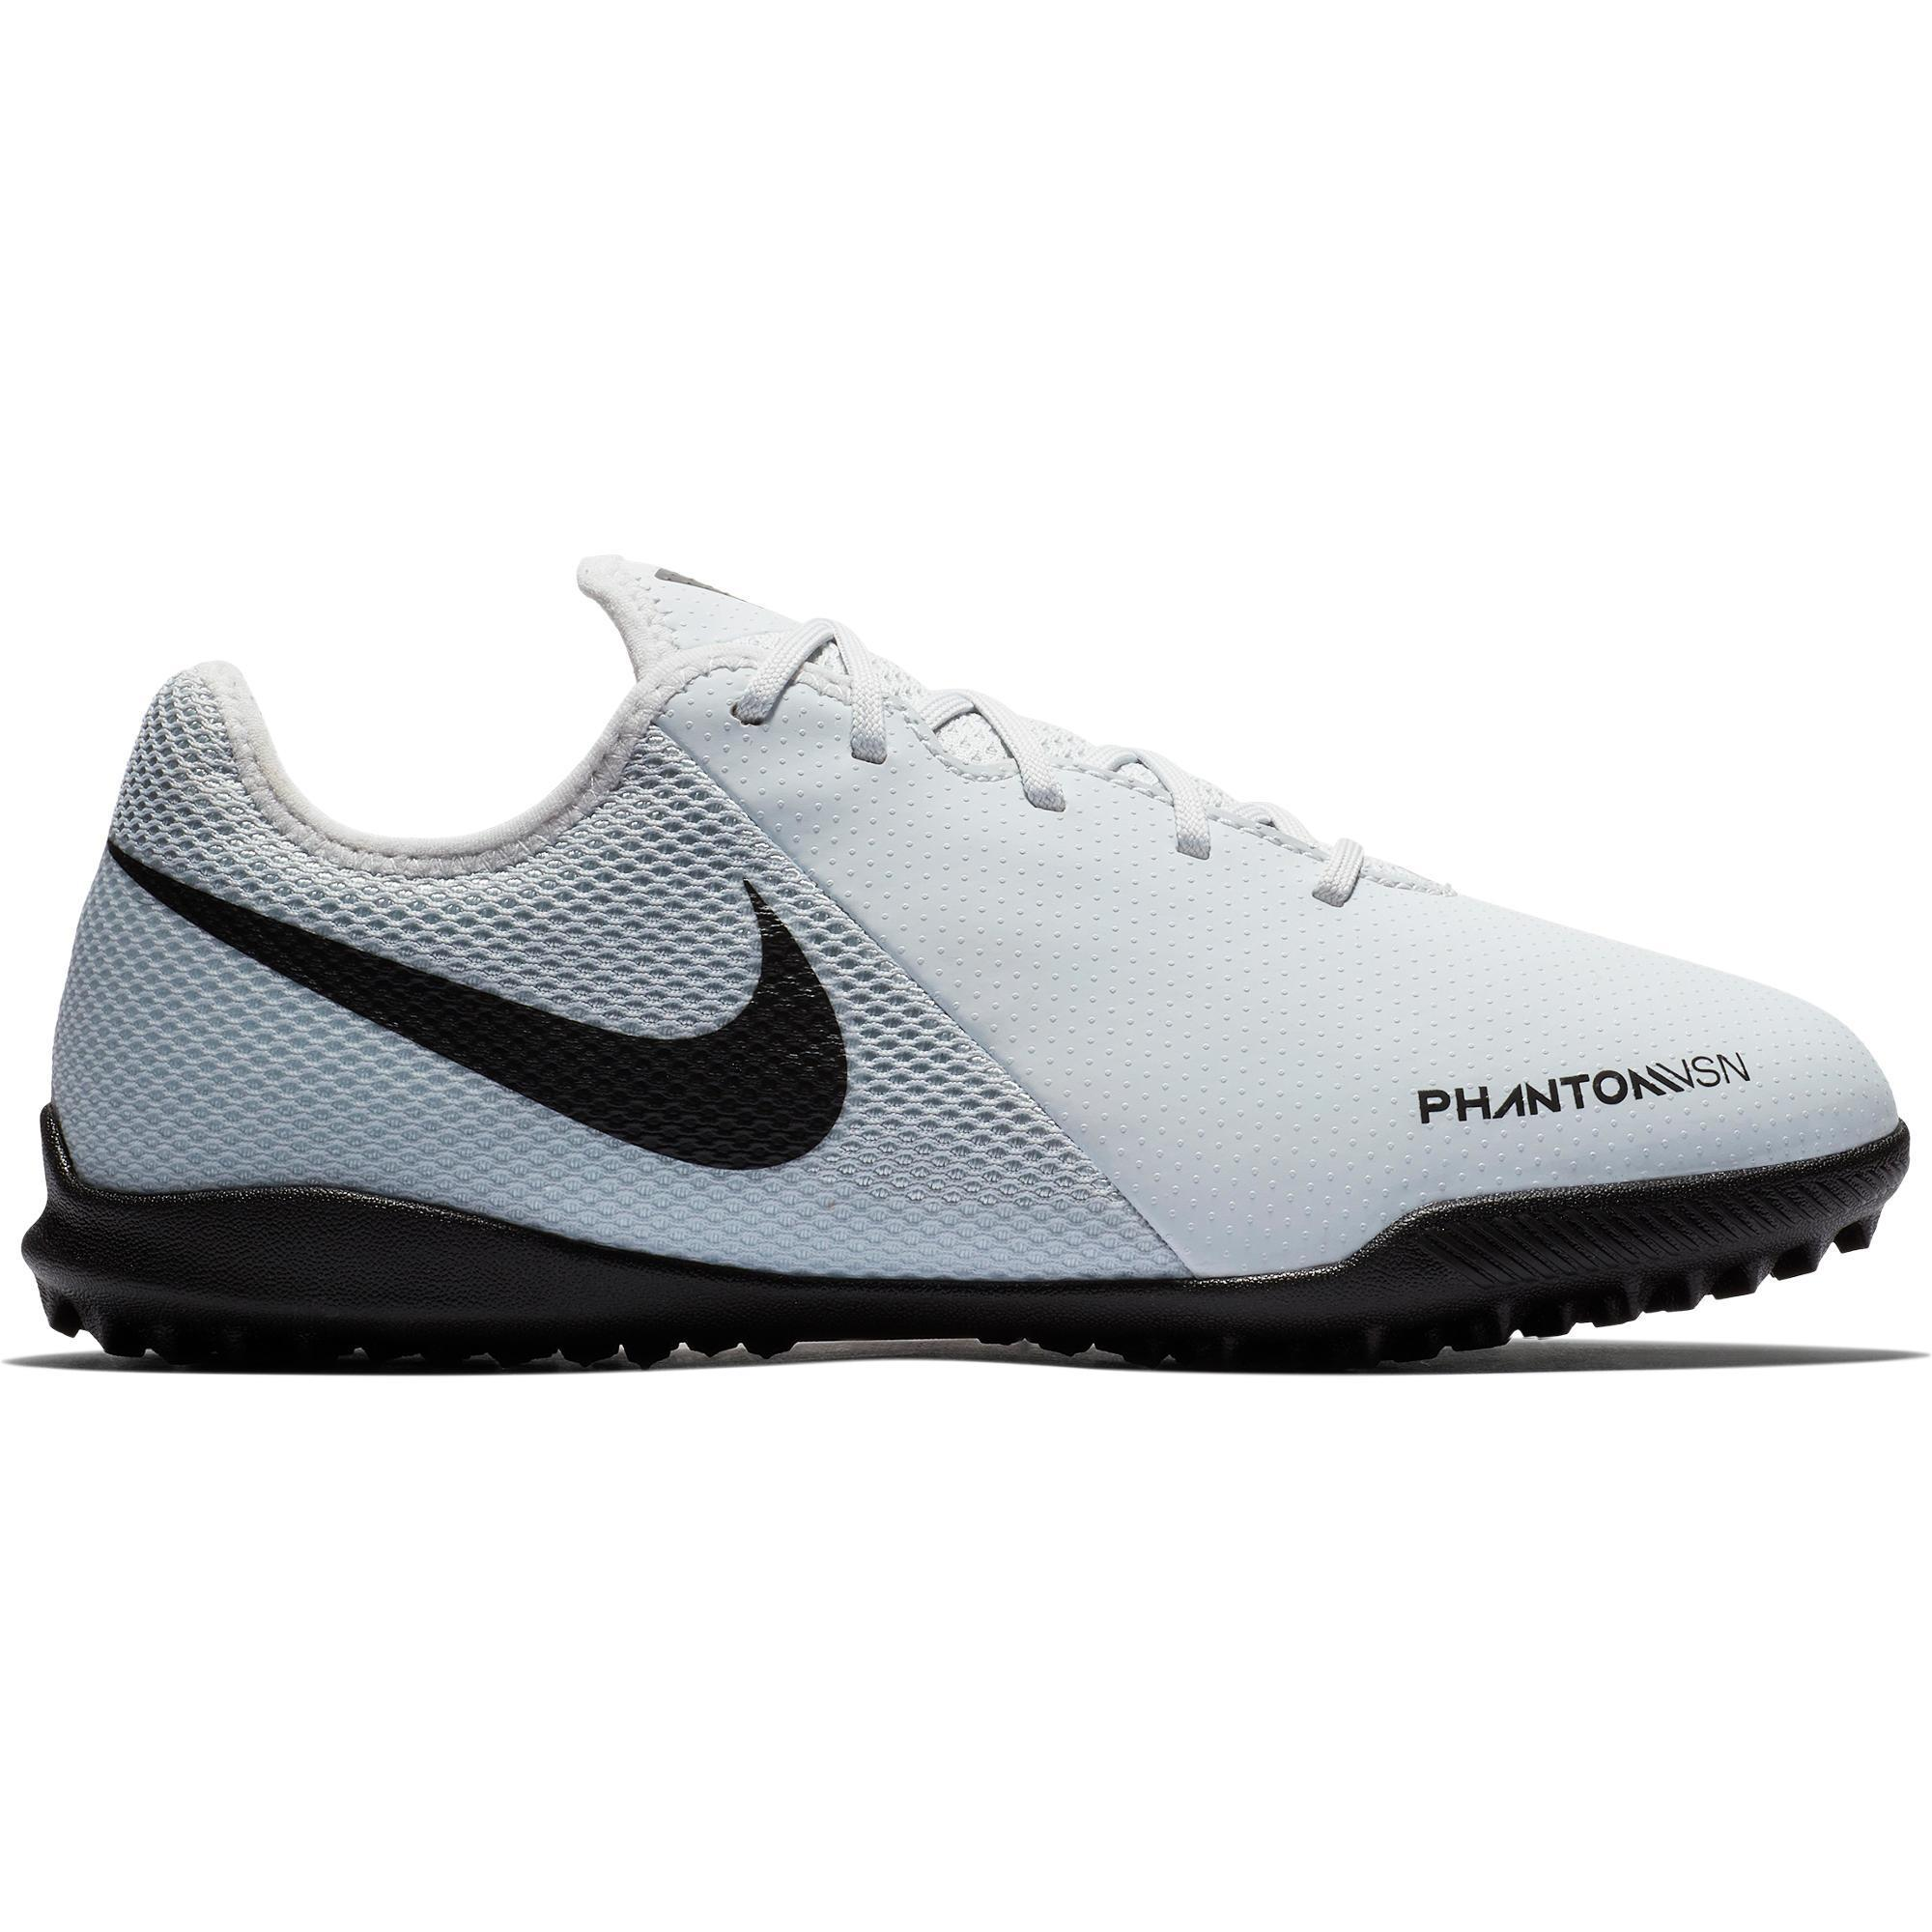 Nike Voetbalschoenen kind Phantom Vision Gato X TF wit/rood